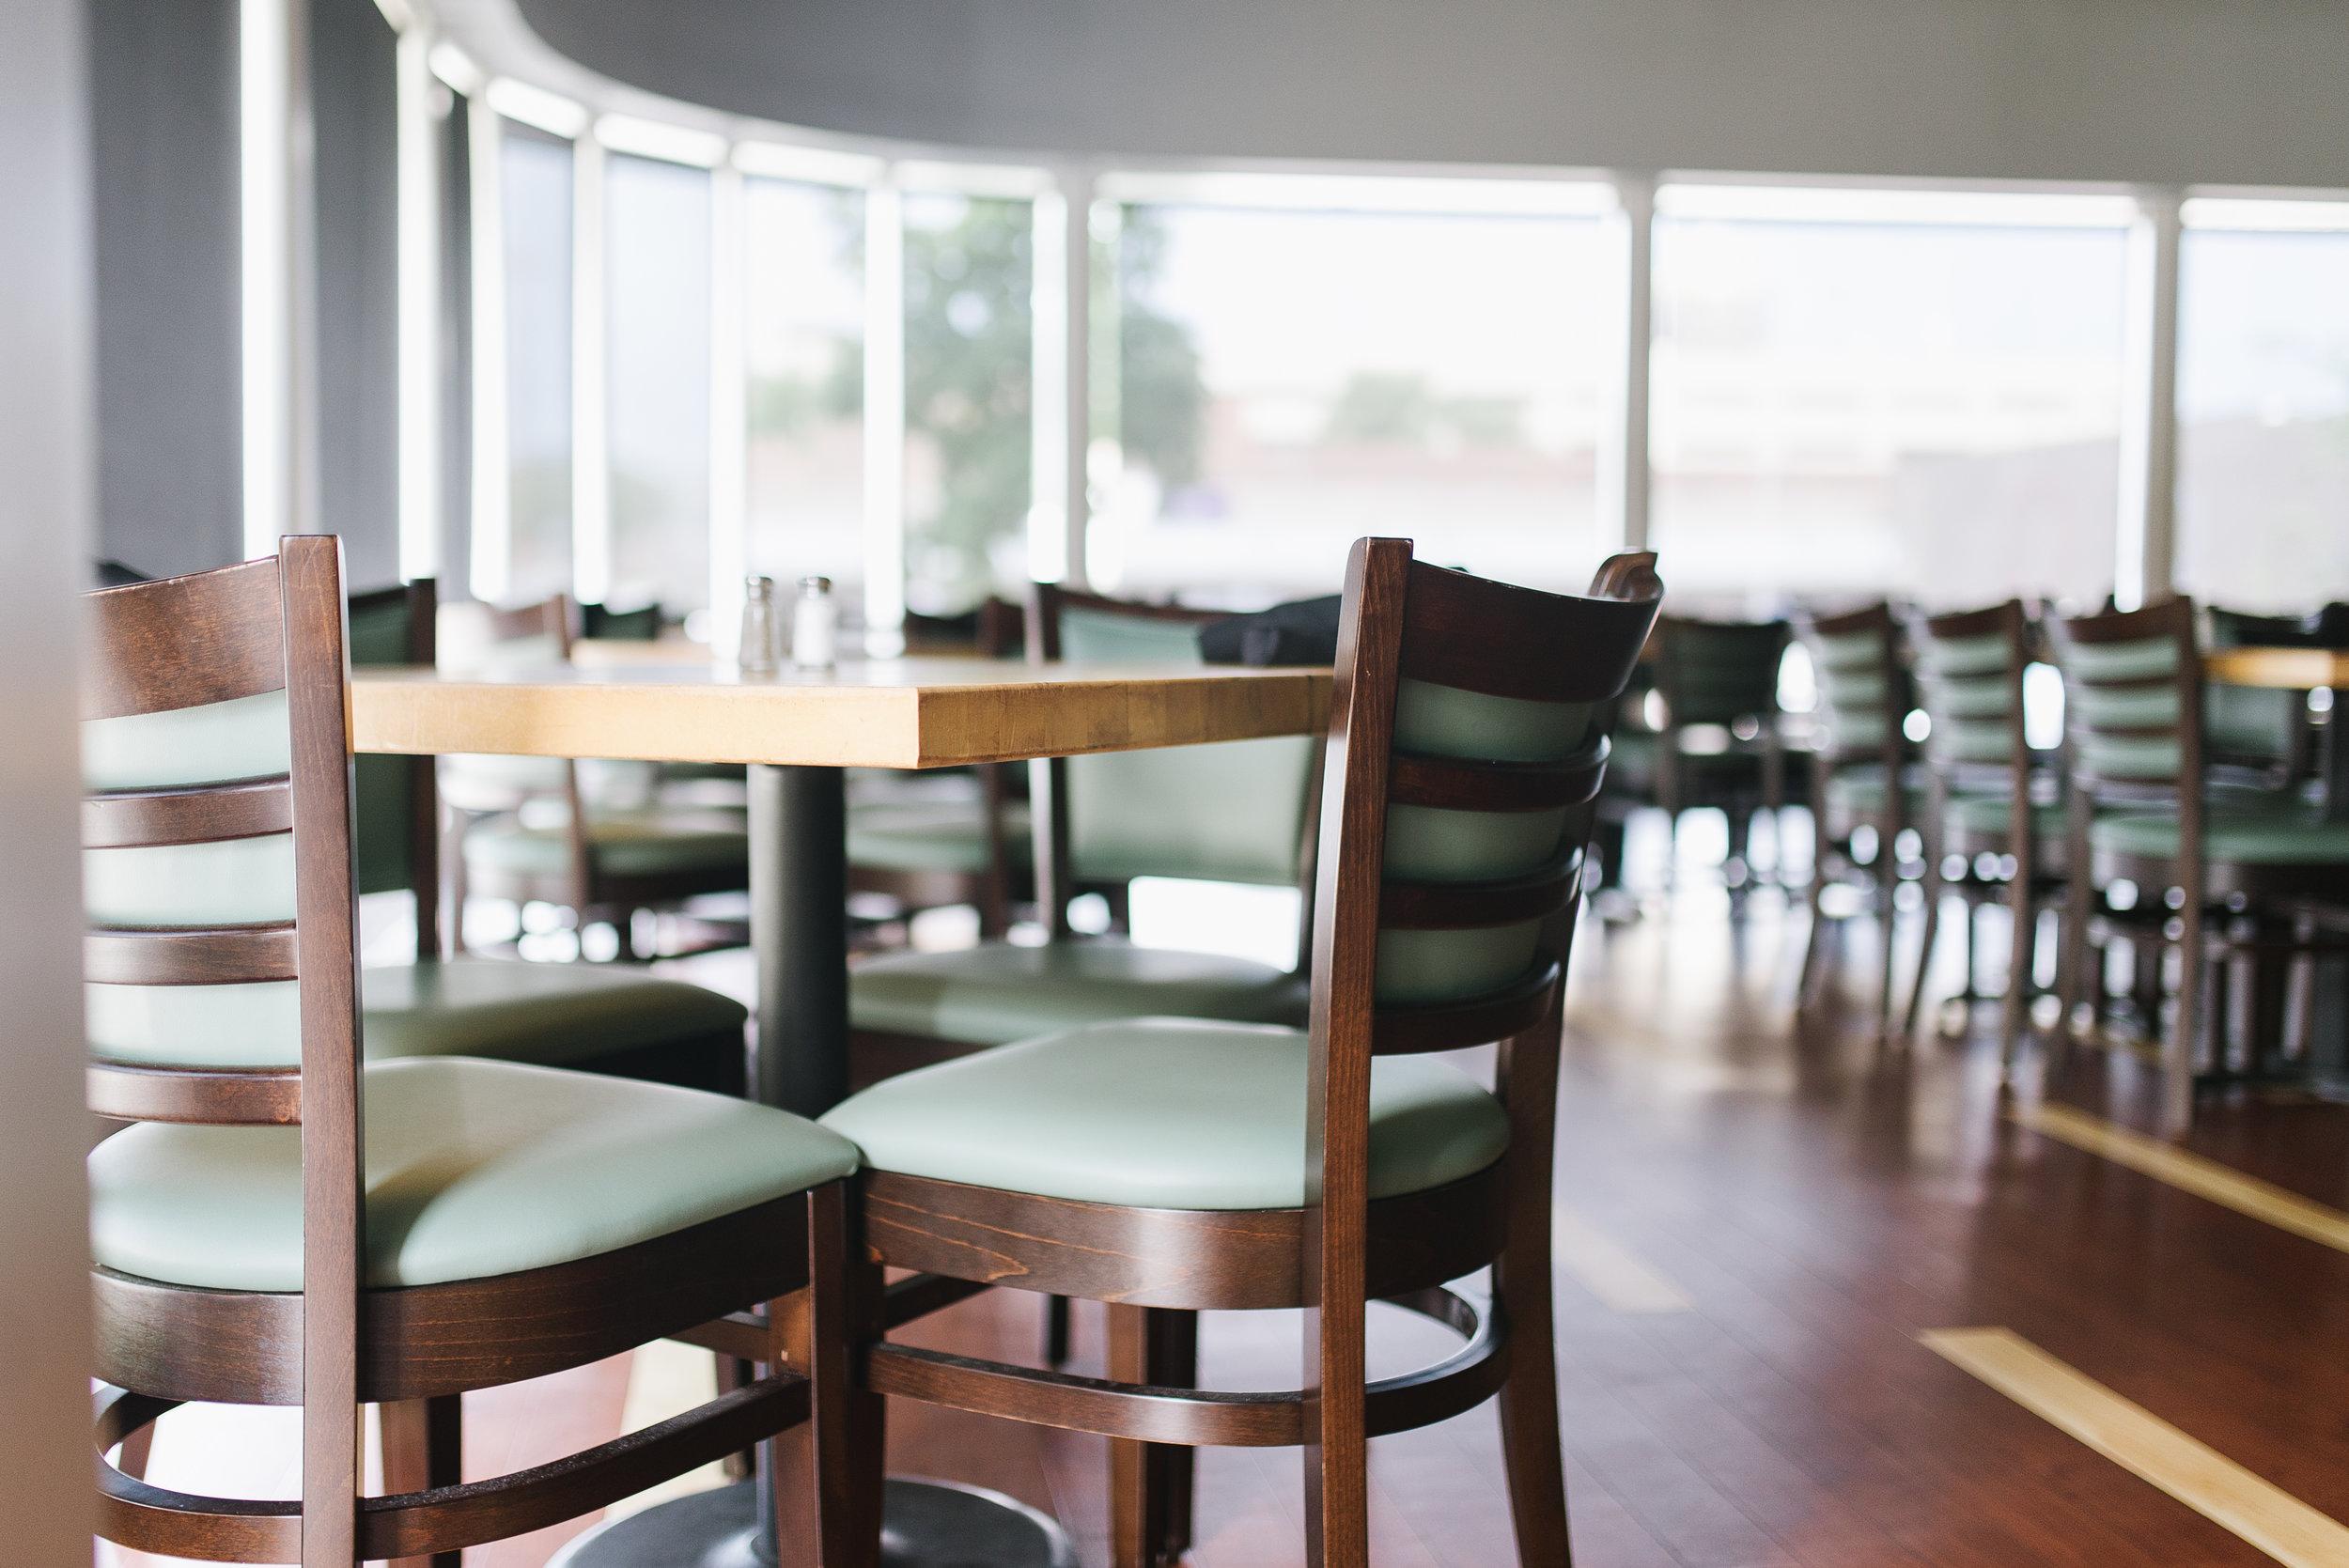 Alba Des Moines, Iowa Restaurant Table 2